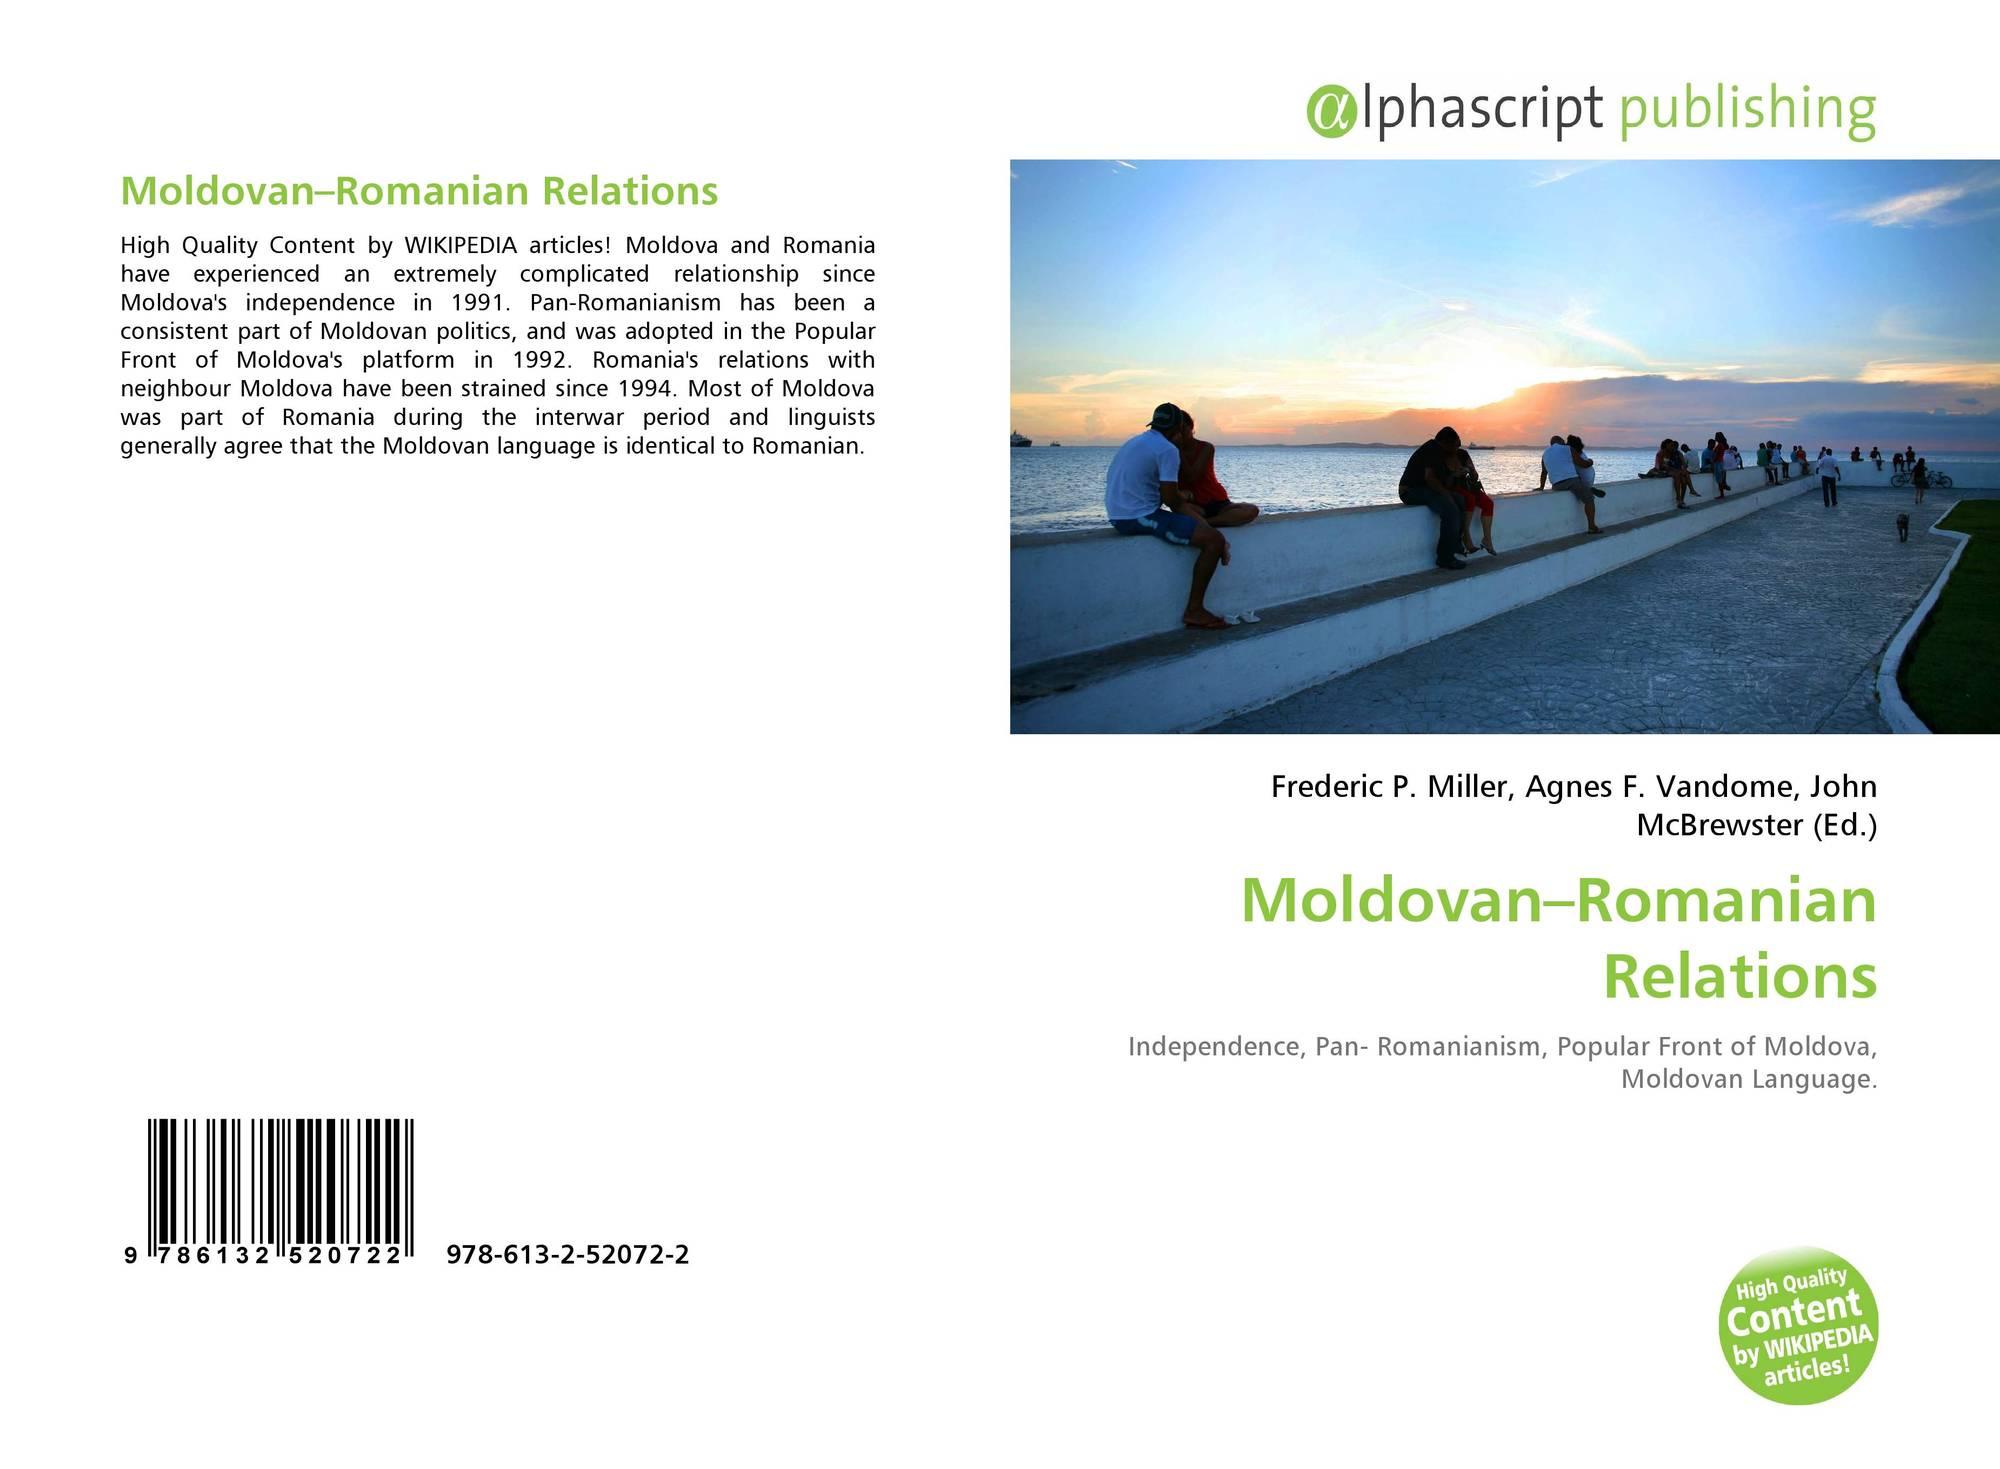 Moldovan–Romanian Relations, 978-613-2-52072-2, 6132520724